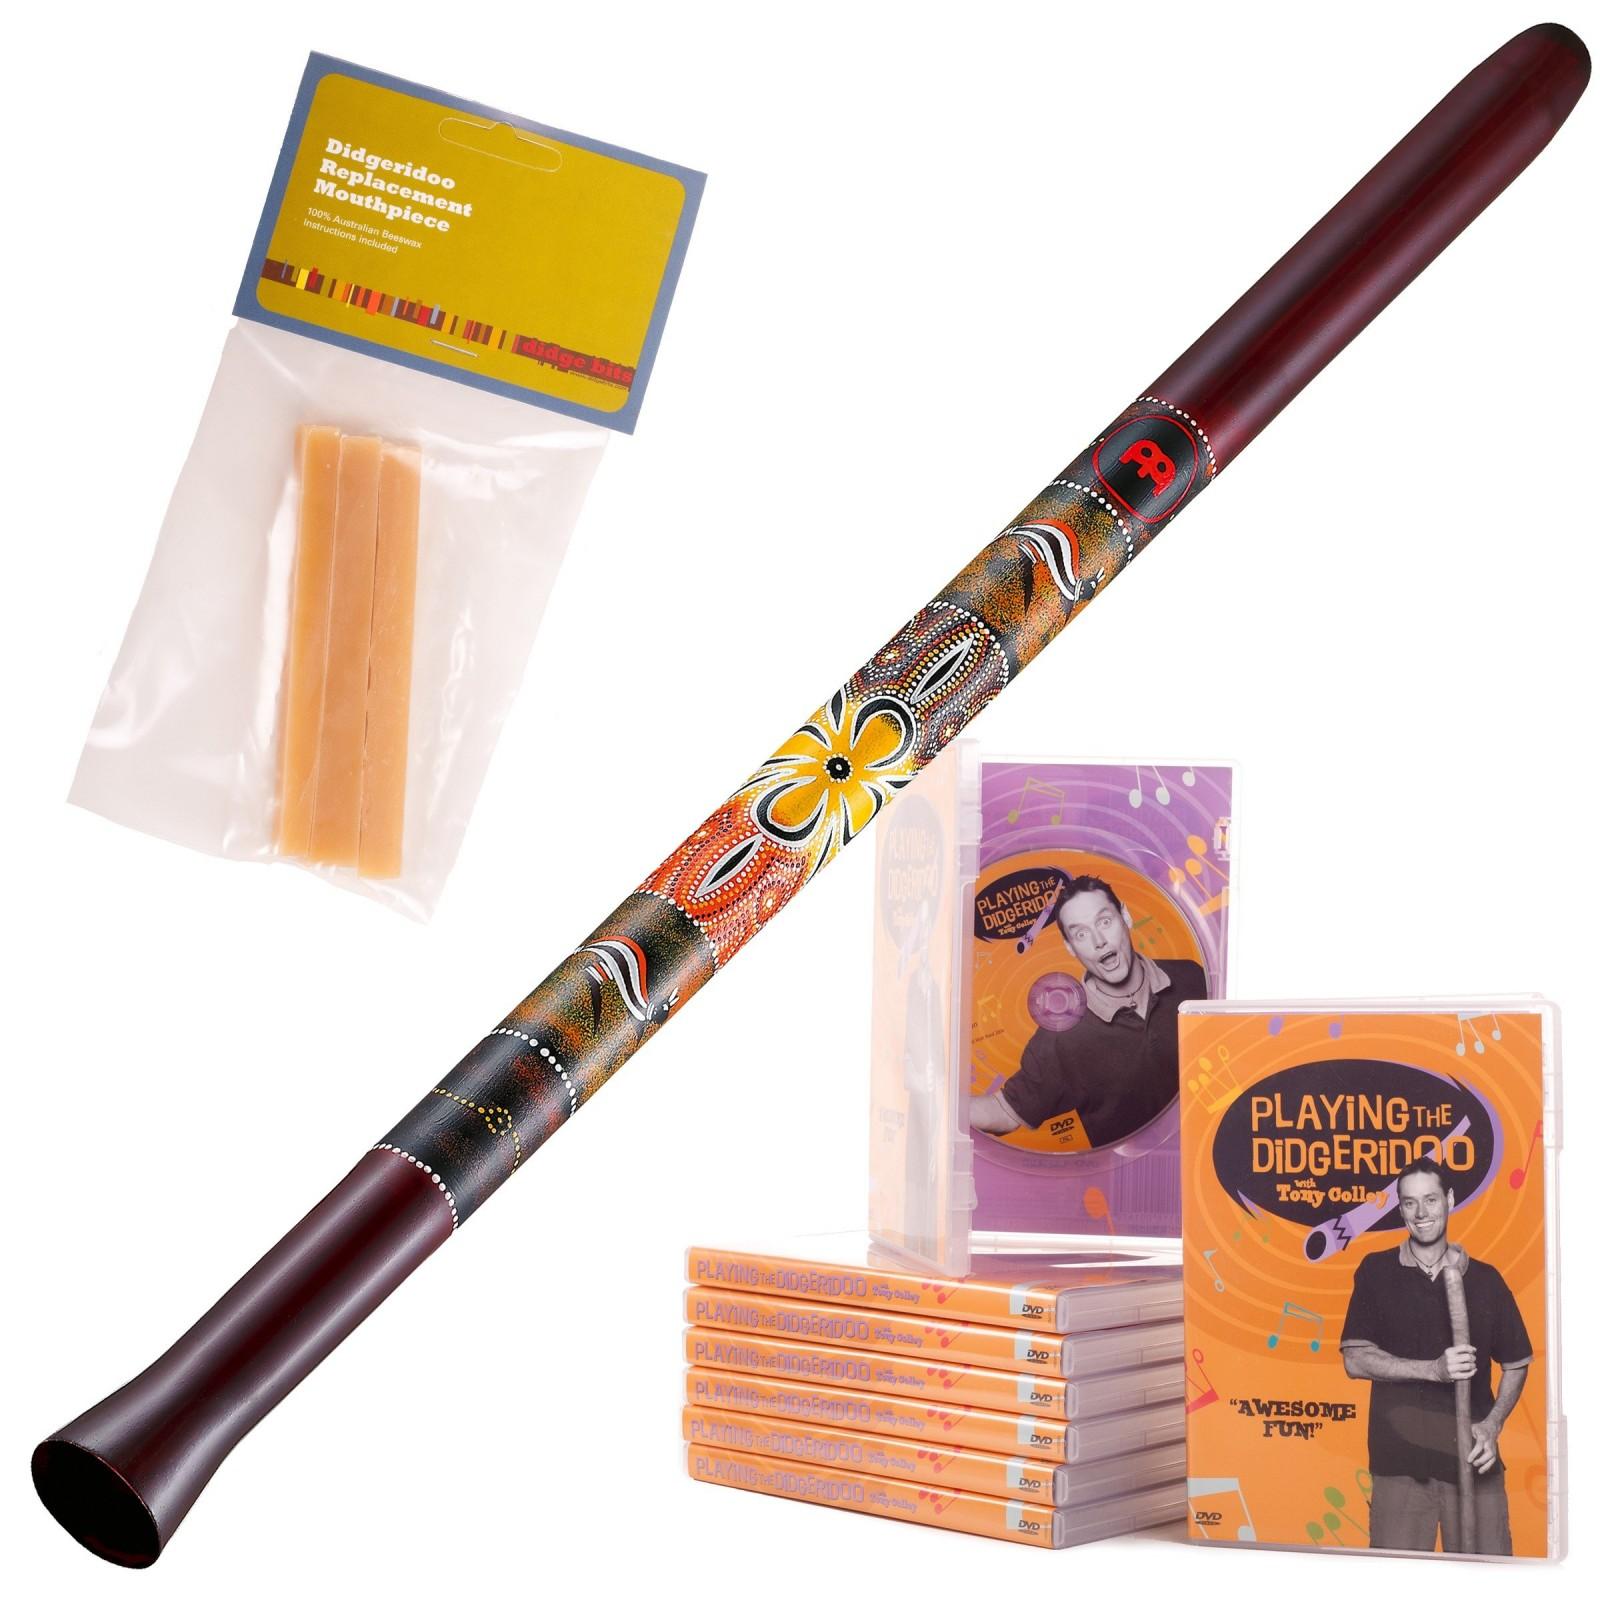 Meinl Didgeridoo (mit nylon bag!) SDDG1-R + Lehrne DVD + Wax